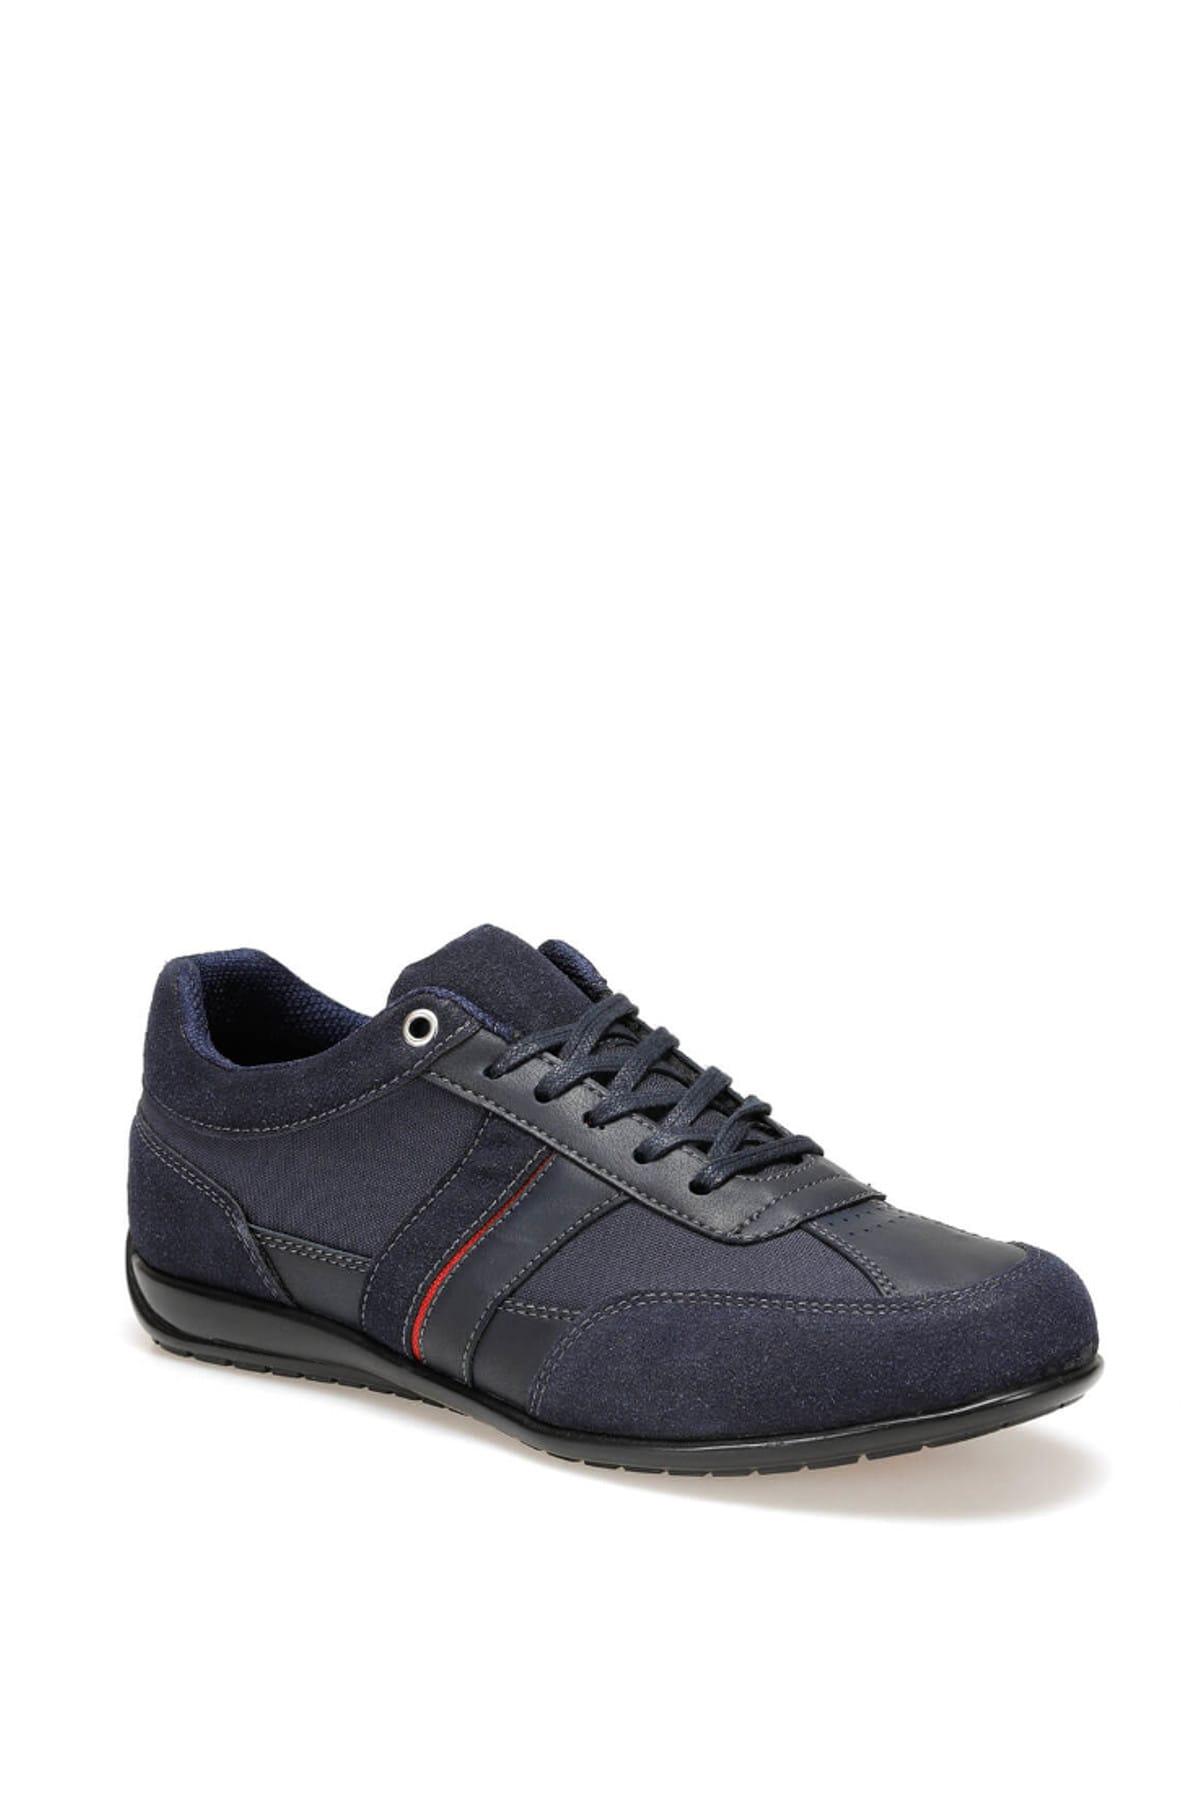 OXIDE NAVIA C Lacivert Erkek Sneaker Ayakkabı 100349396 1